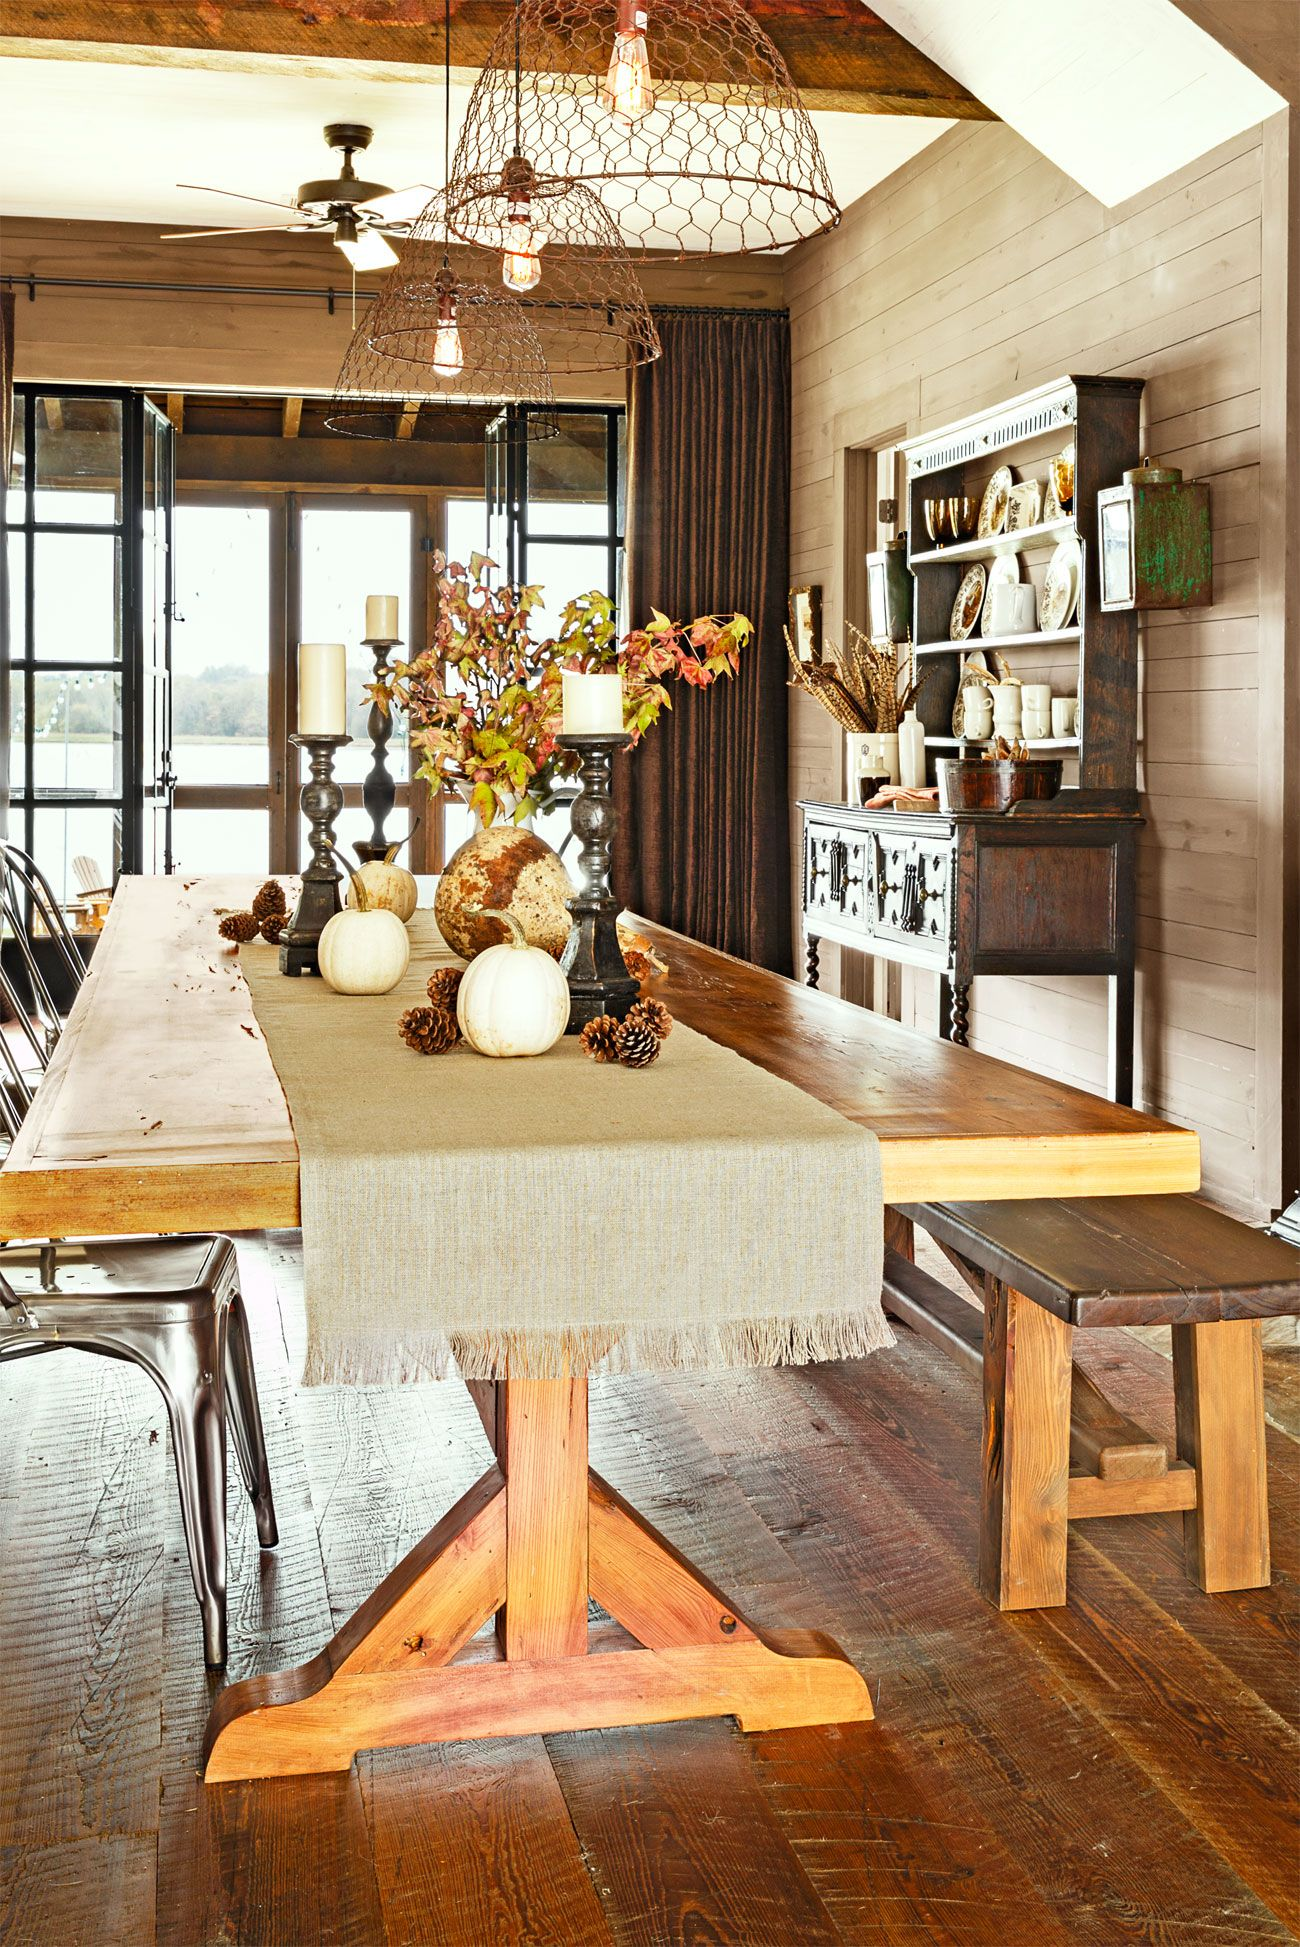 51 Fall Table Centerpieces - Autumn Centerpiece Ideas